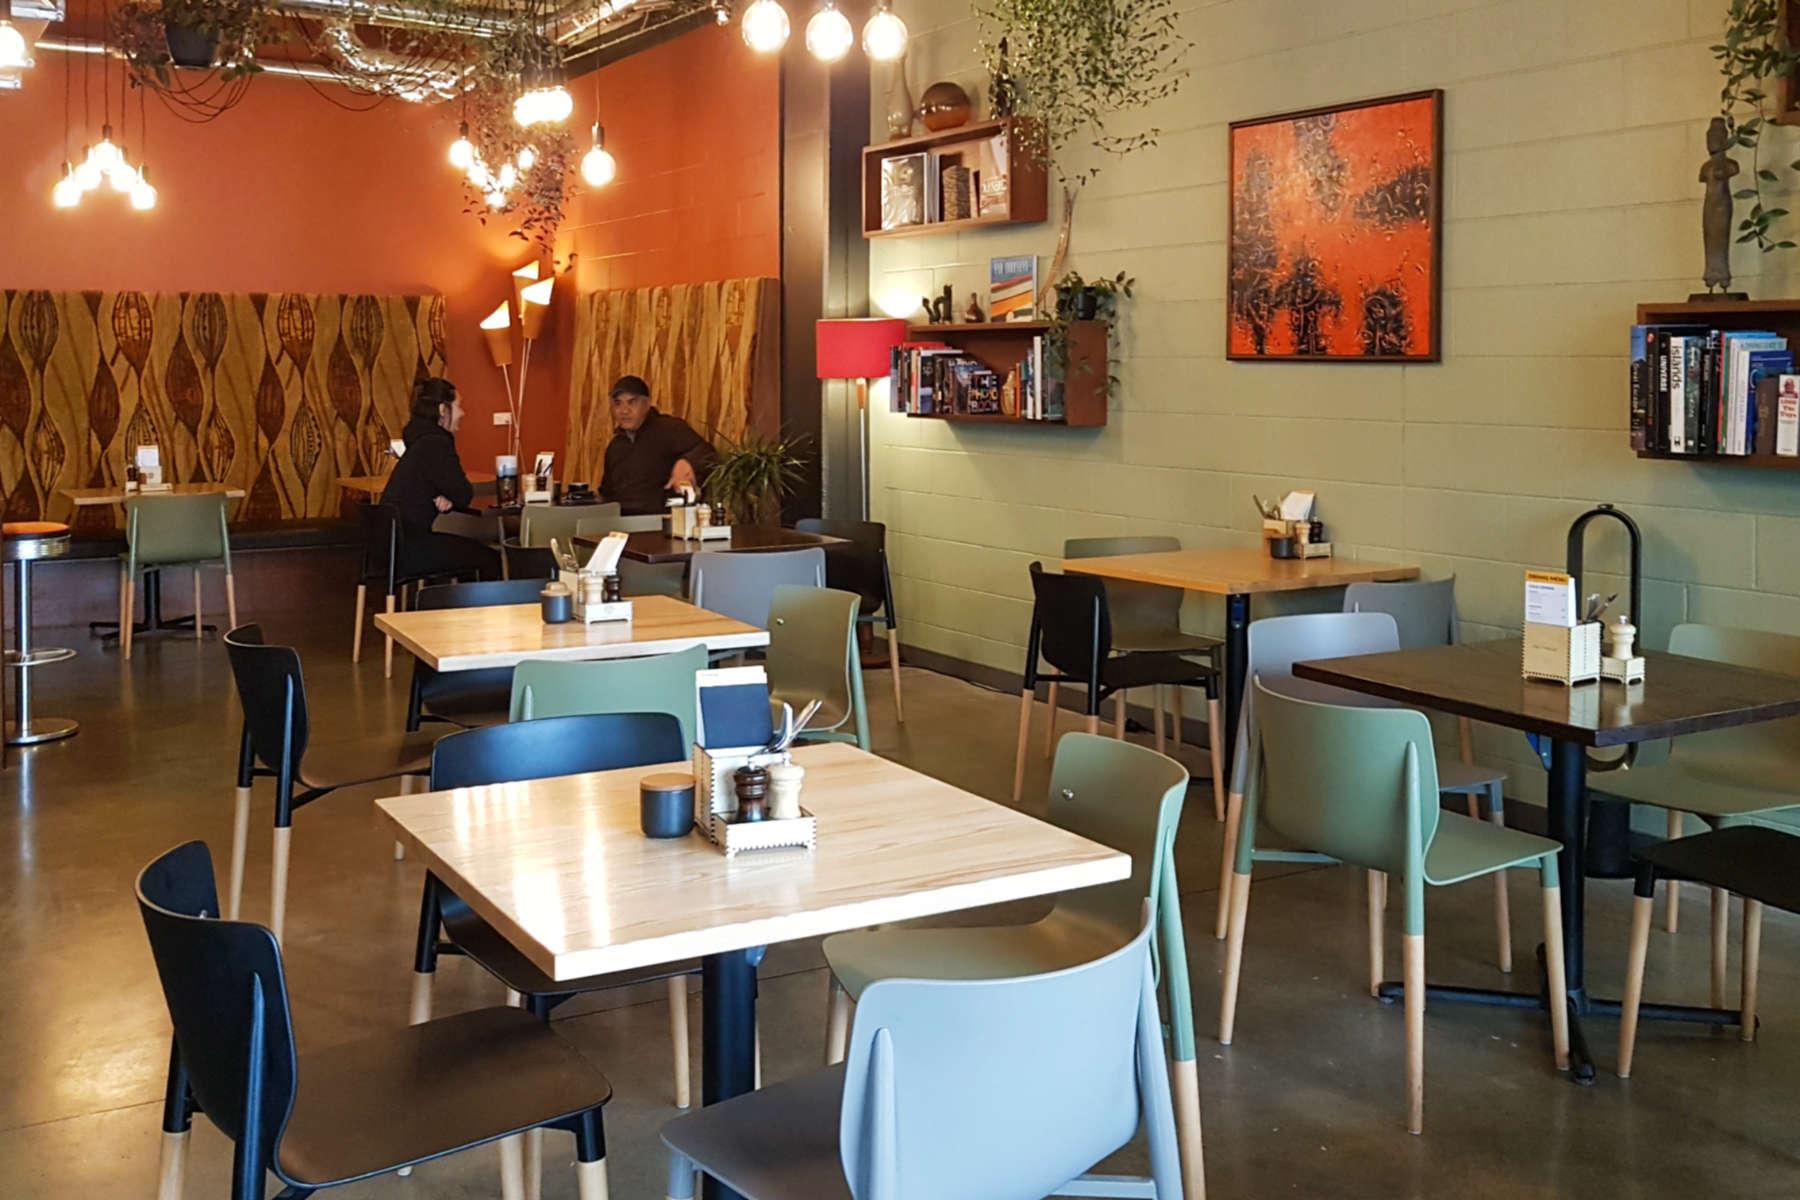 Faith & Co interior - view to back